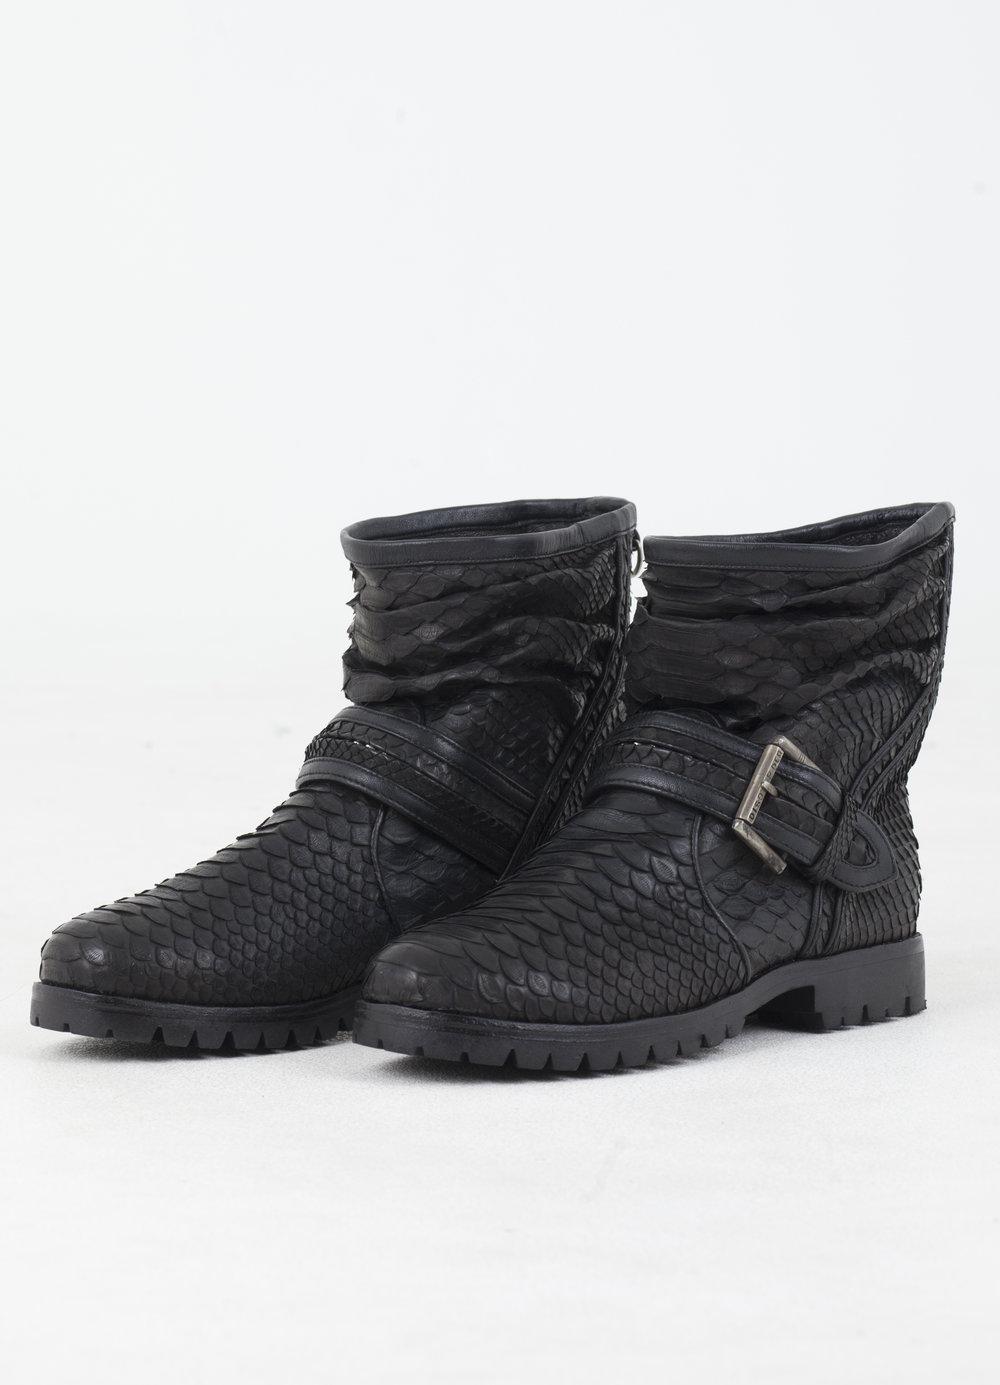 agoraphobia-collective-defiant-disorder-koma-snakeskin-boots